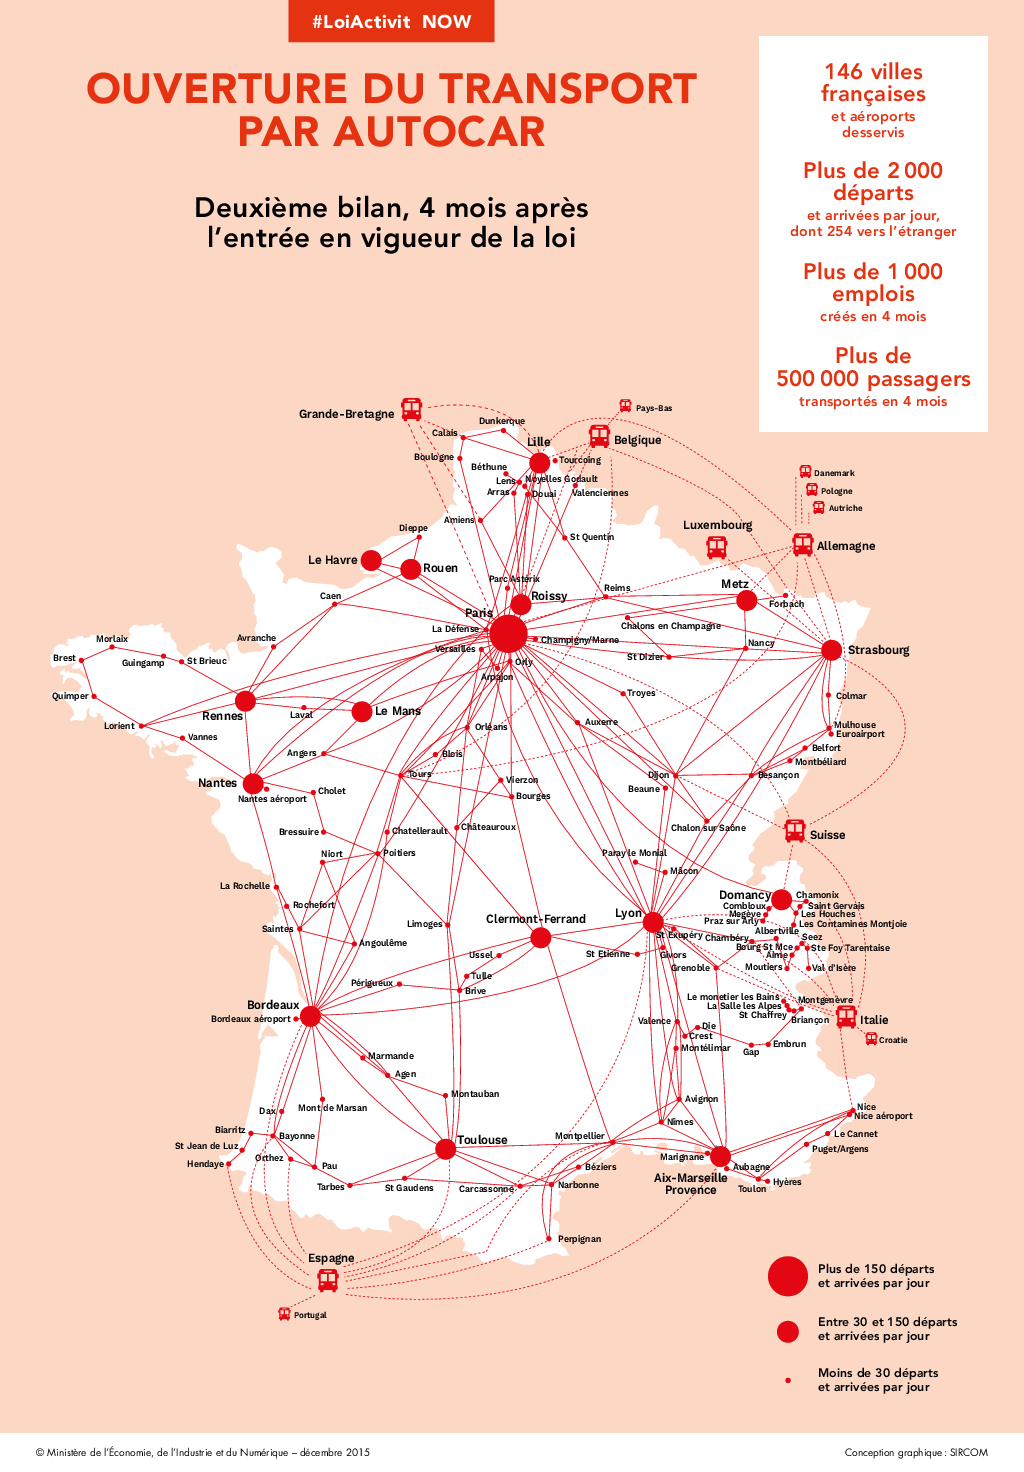 Infographie bilan bus macron 4 mois après la libéralisation